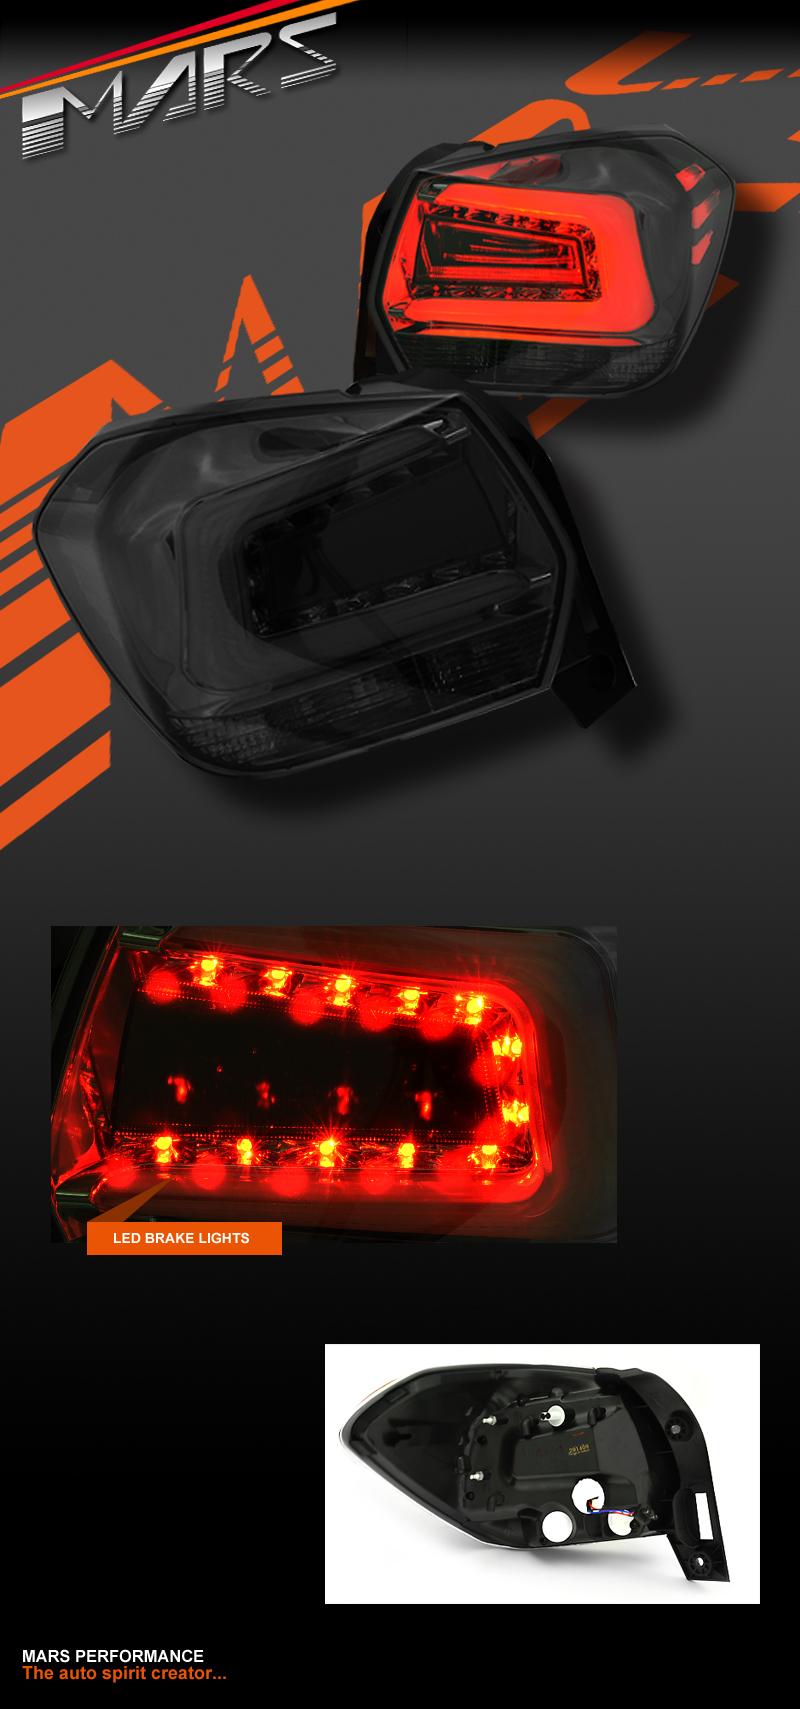 Jdm Smoked Black Led Tail Lights For Subaru Xv G4 X 12 15